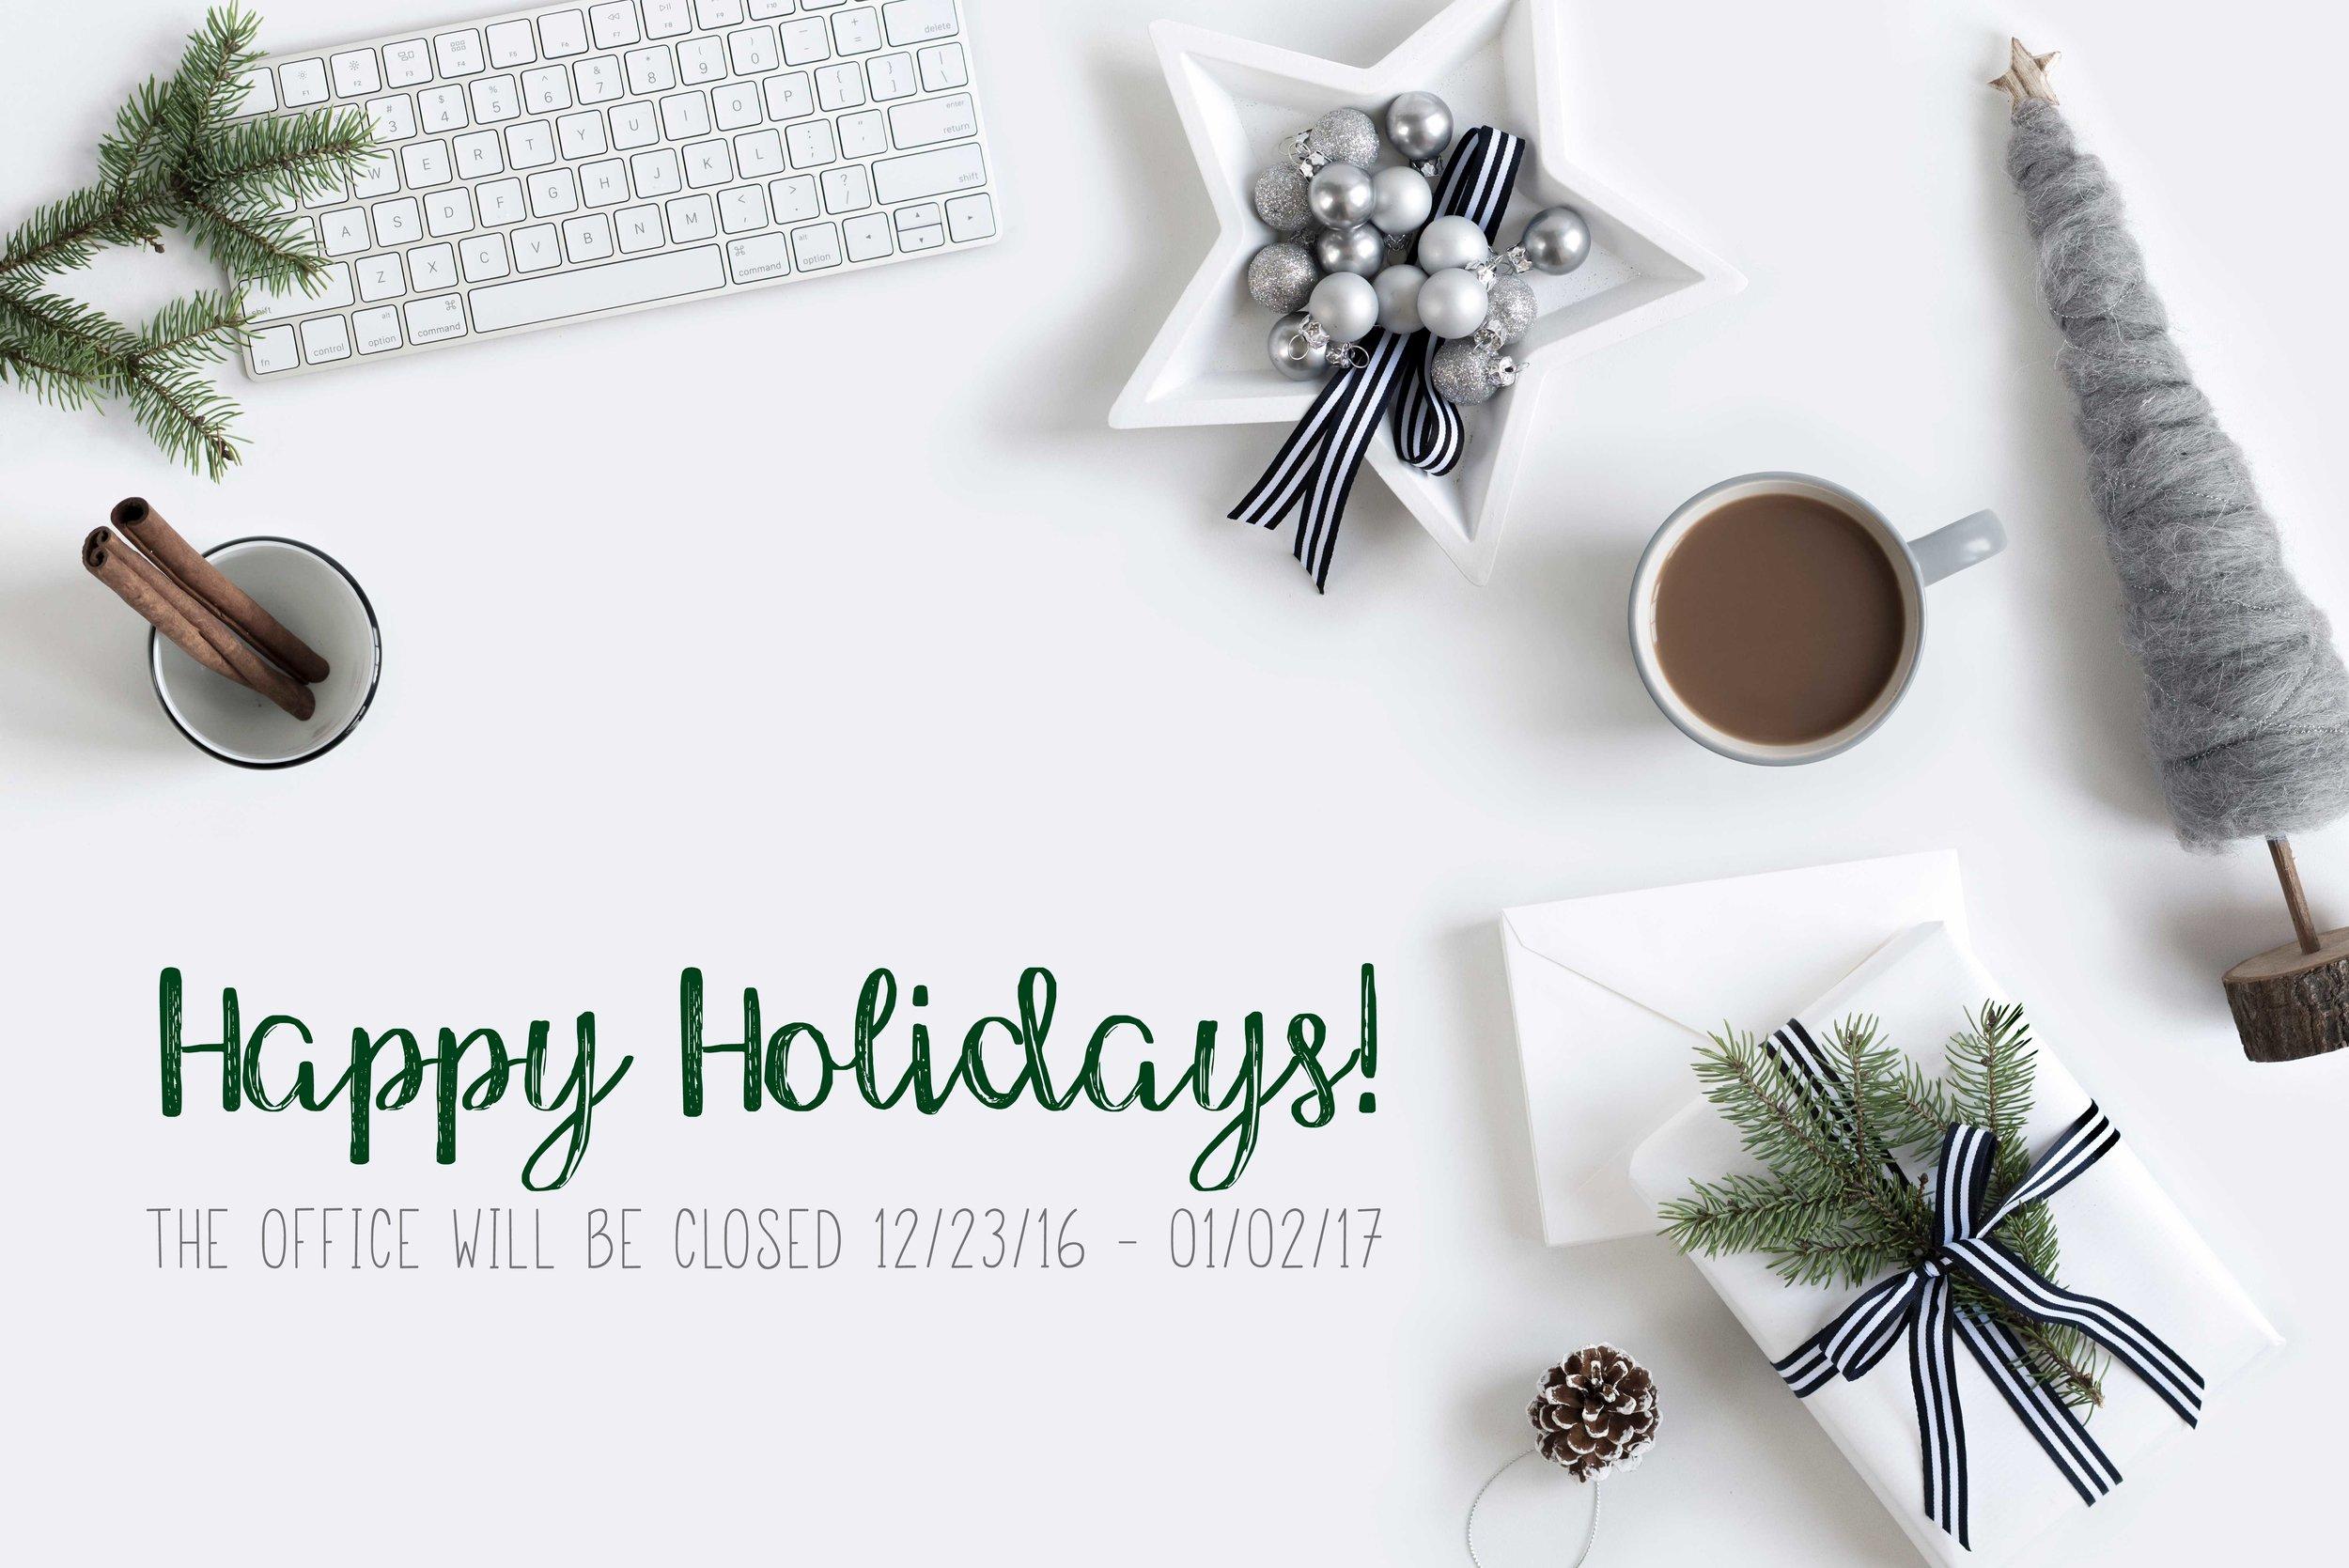 Holiday Hours - SarahMoon.net